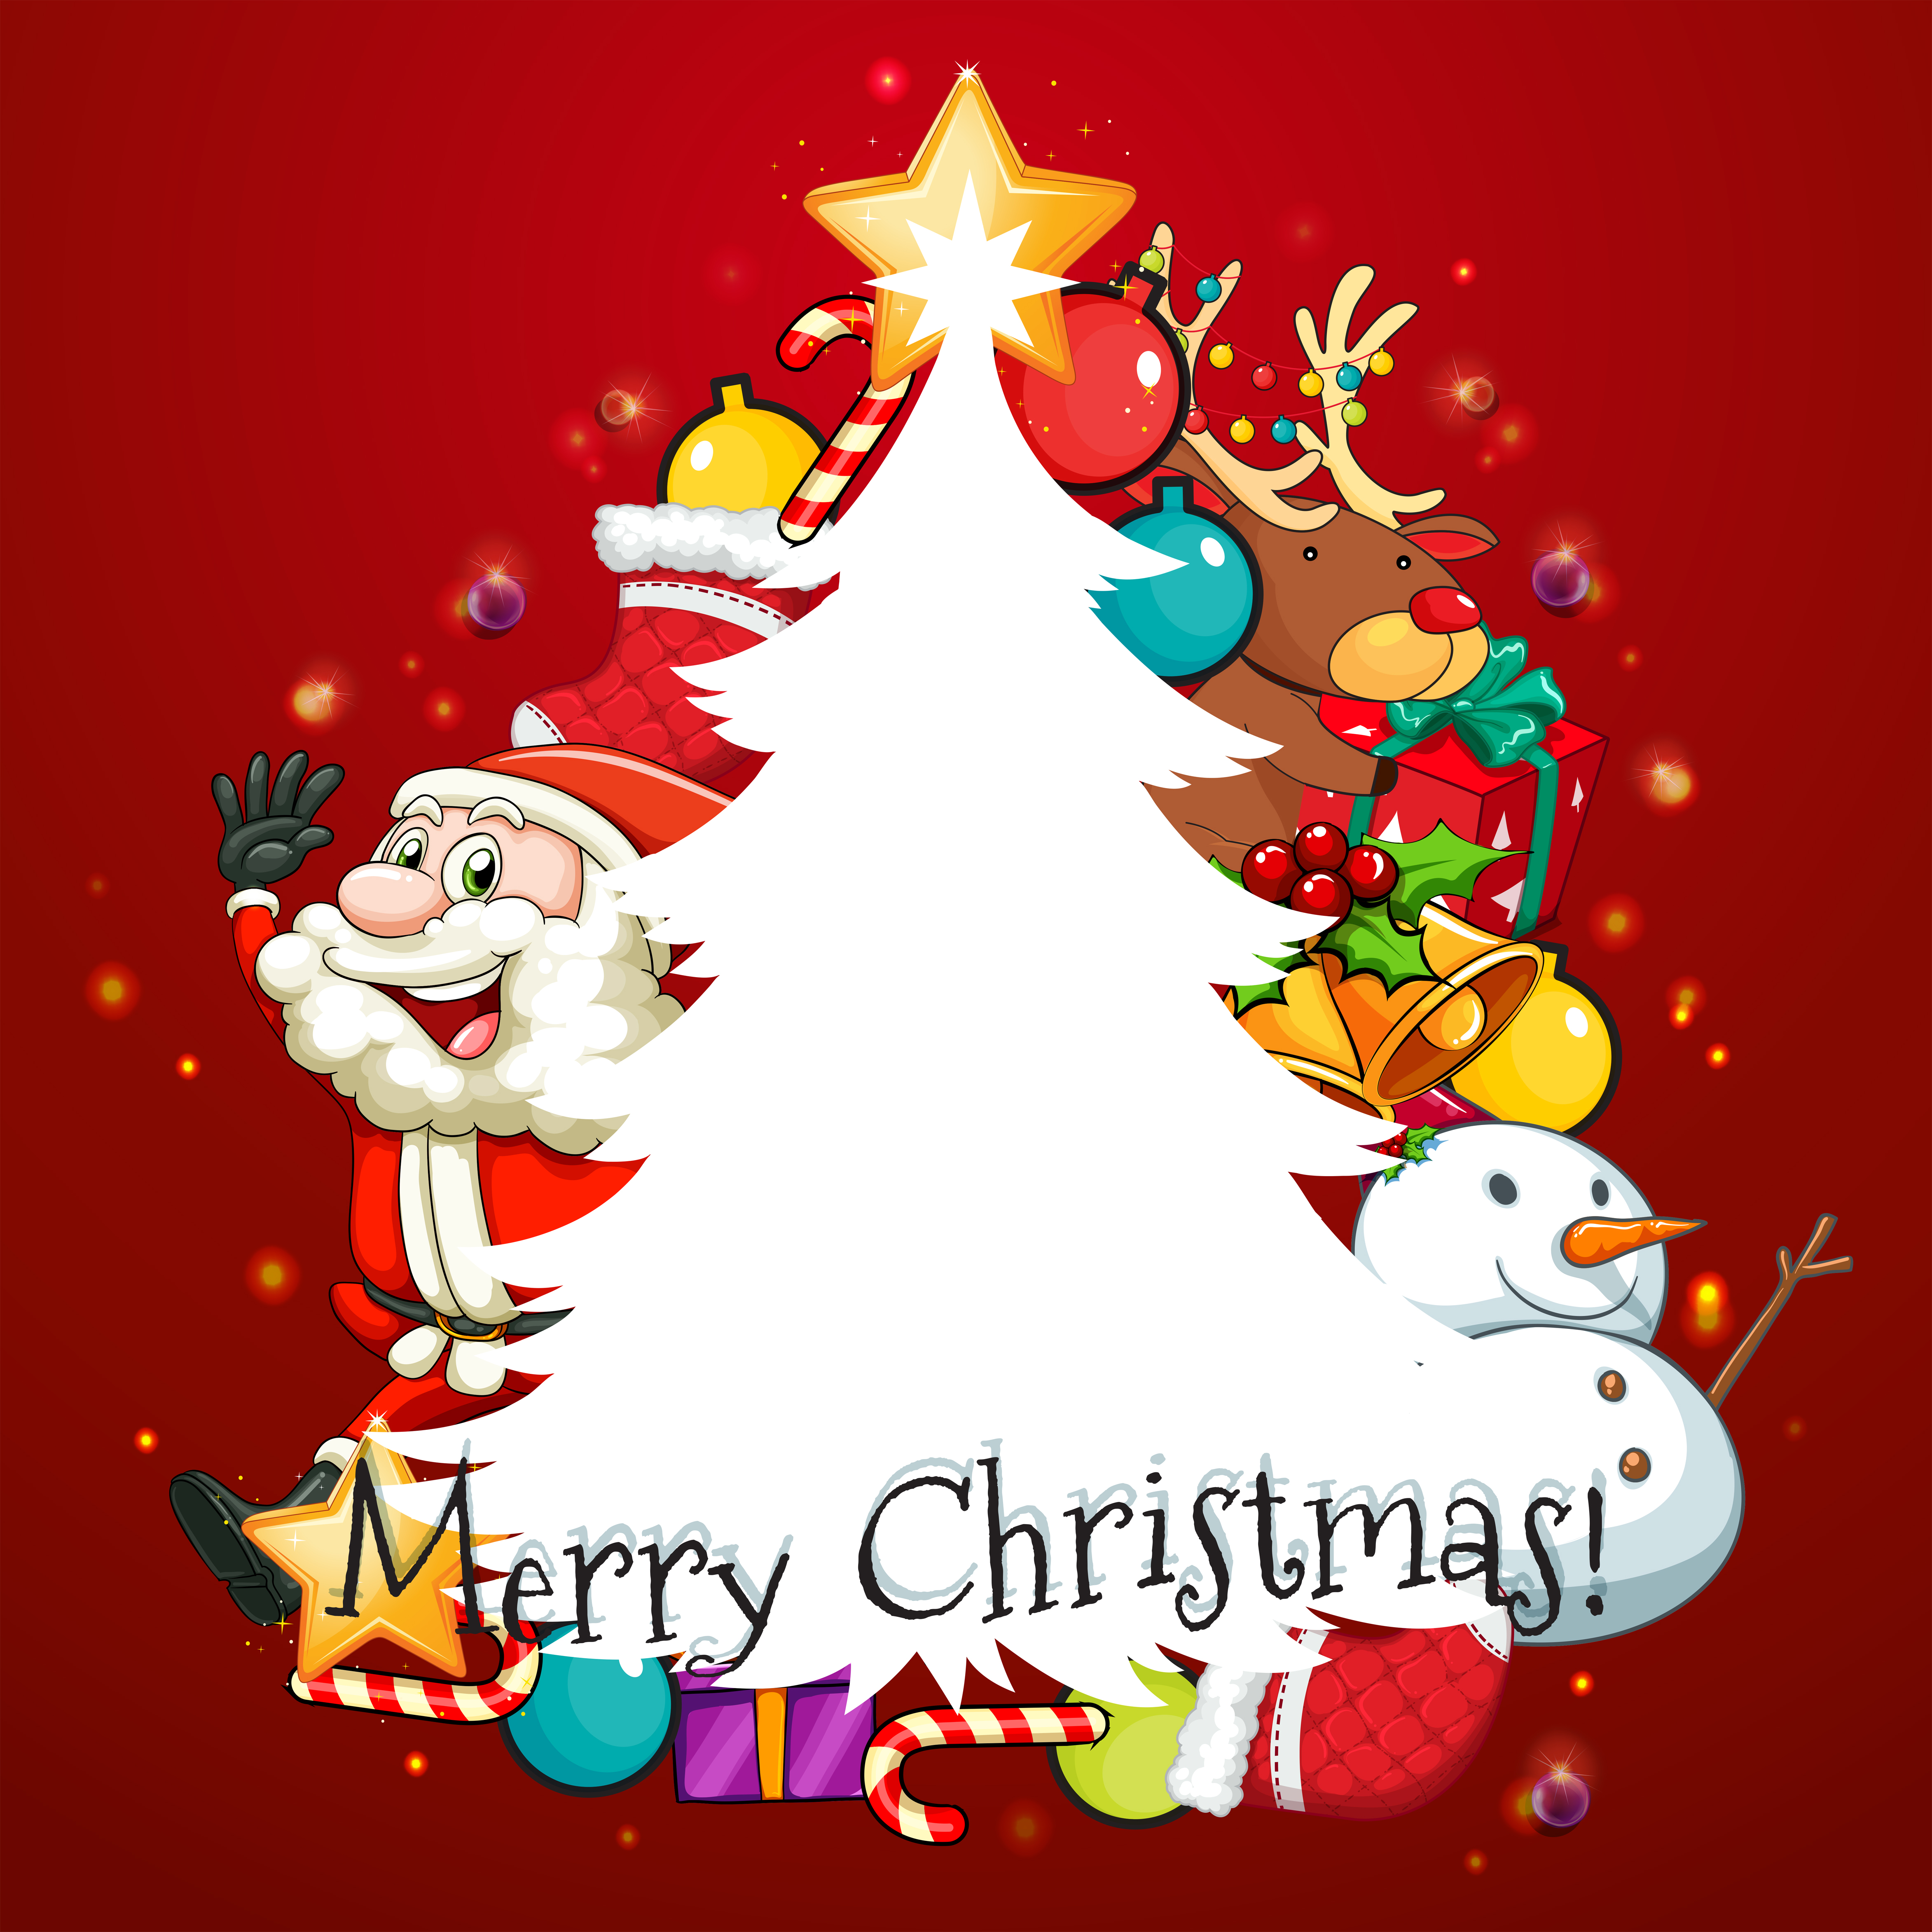 Christmas Tree Merry Christmas: Merry Christmas Card With Santa And Tree